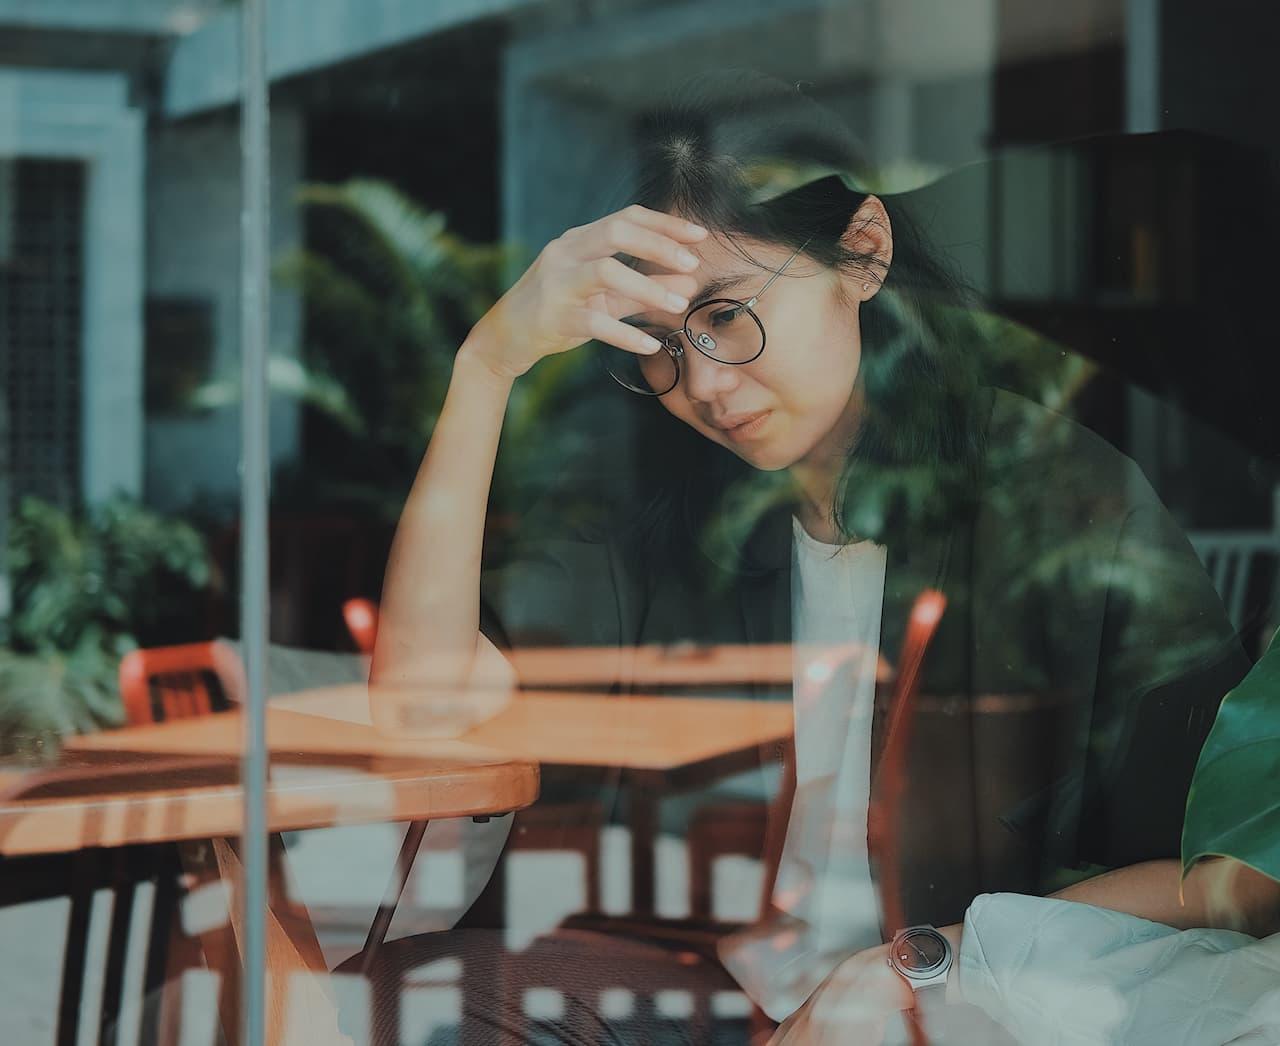 5 maneras de pedir que te paguen una factura sin sentirte culpable